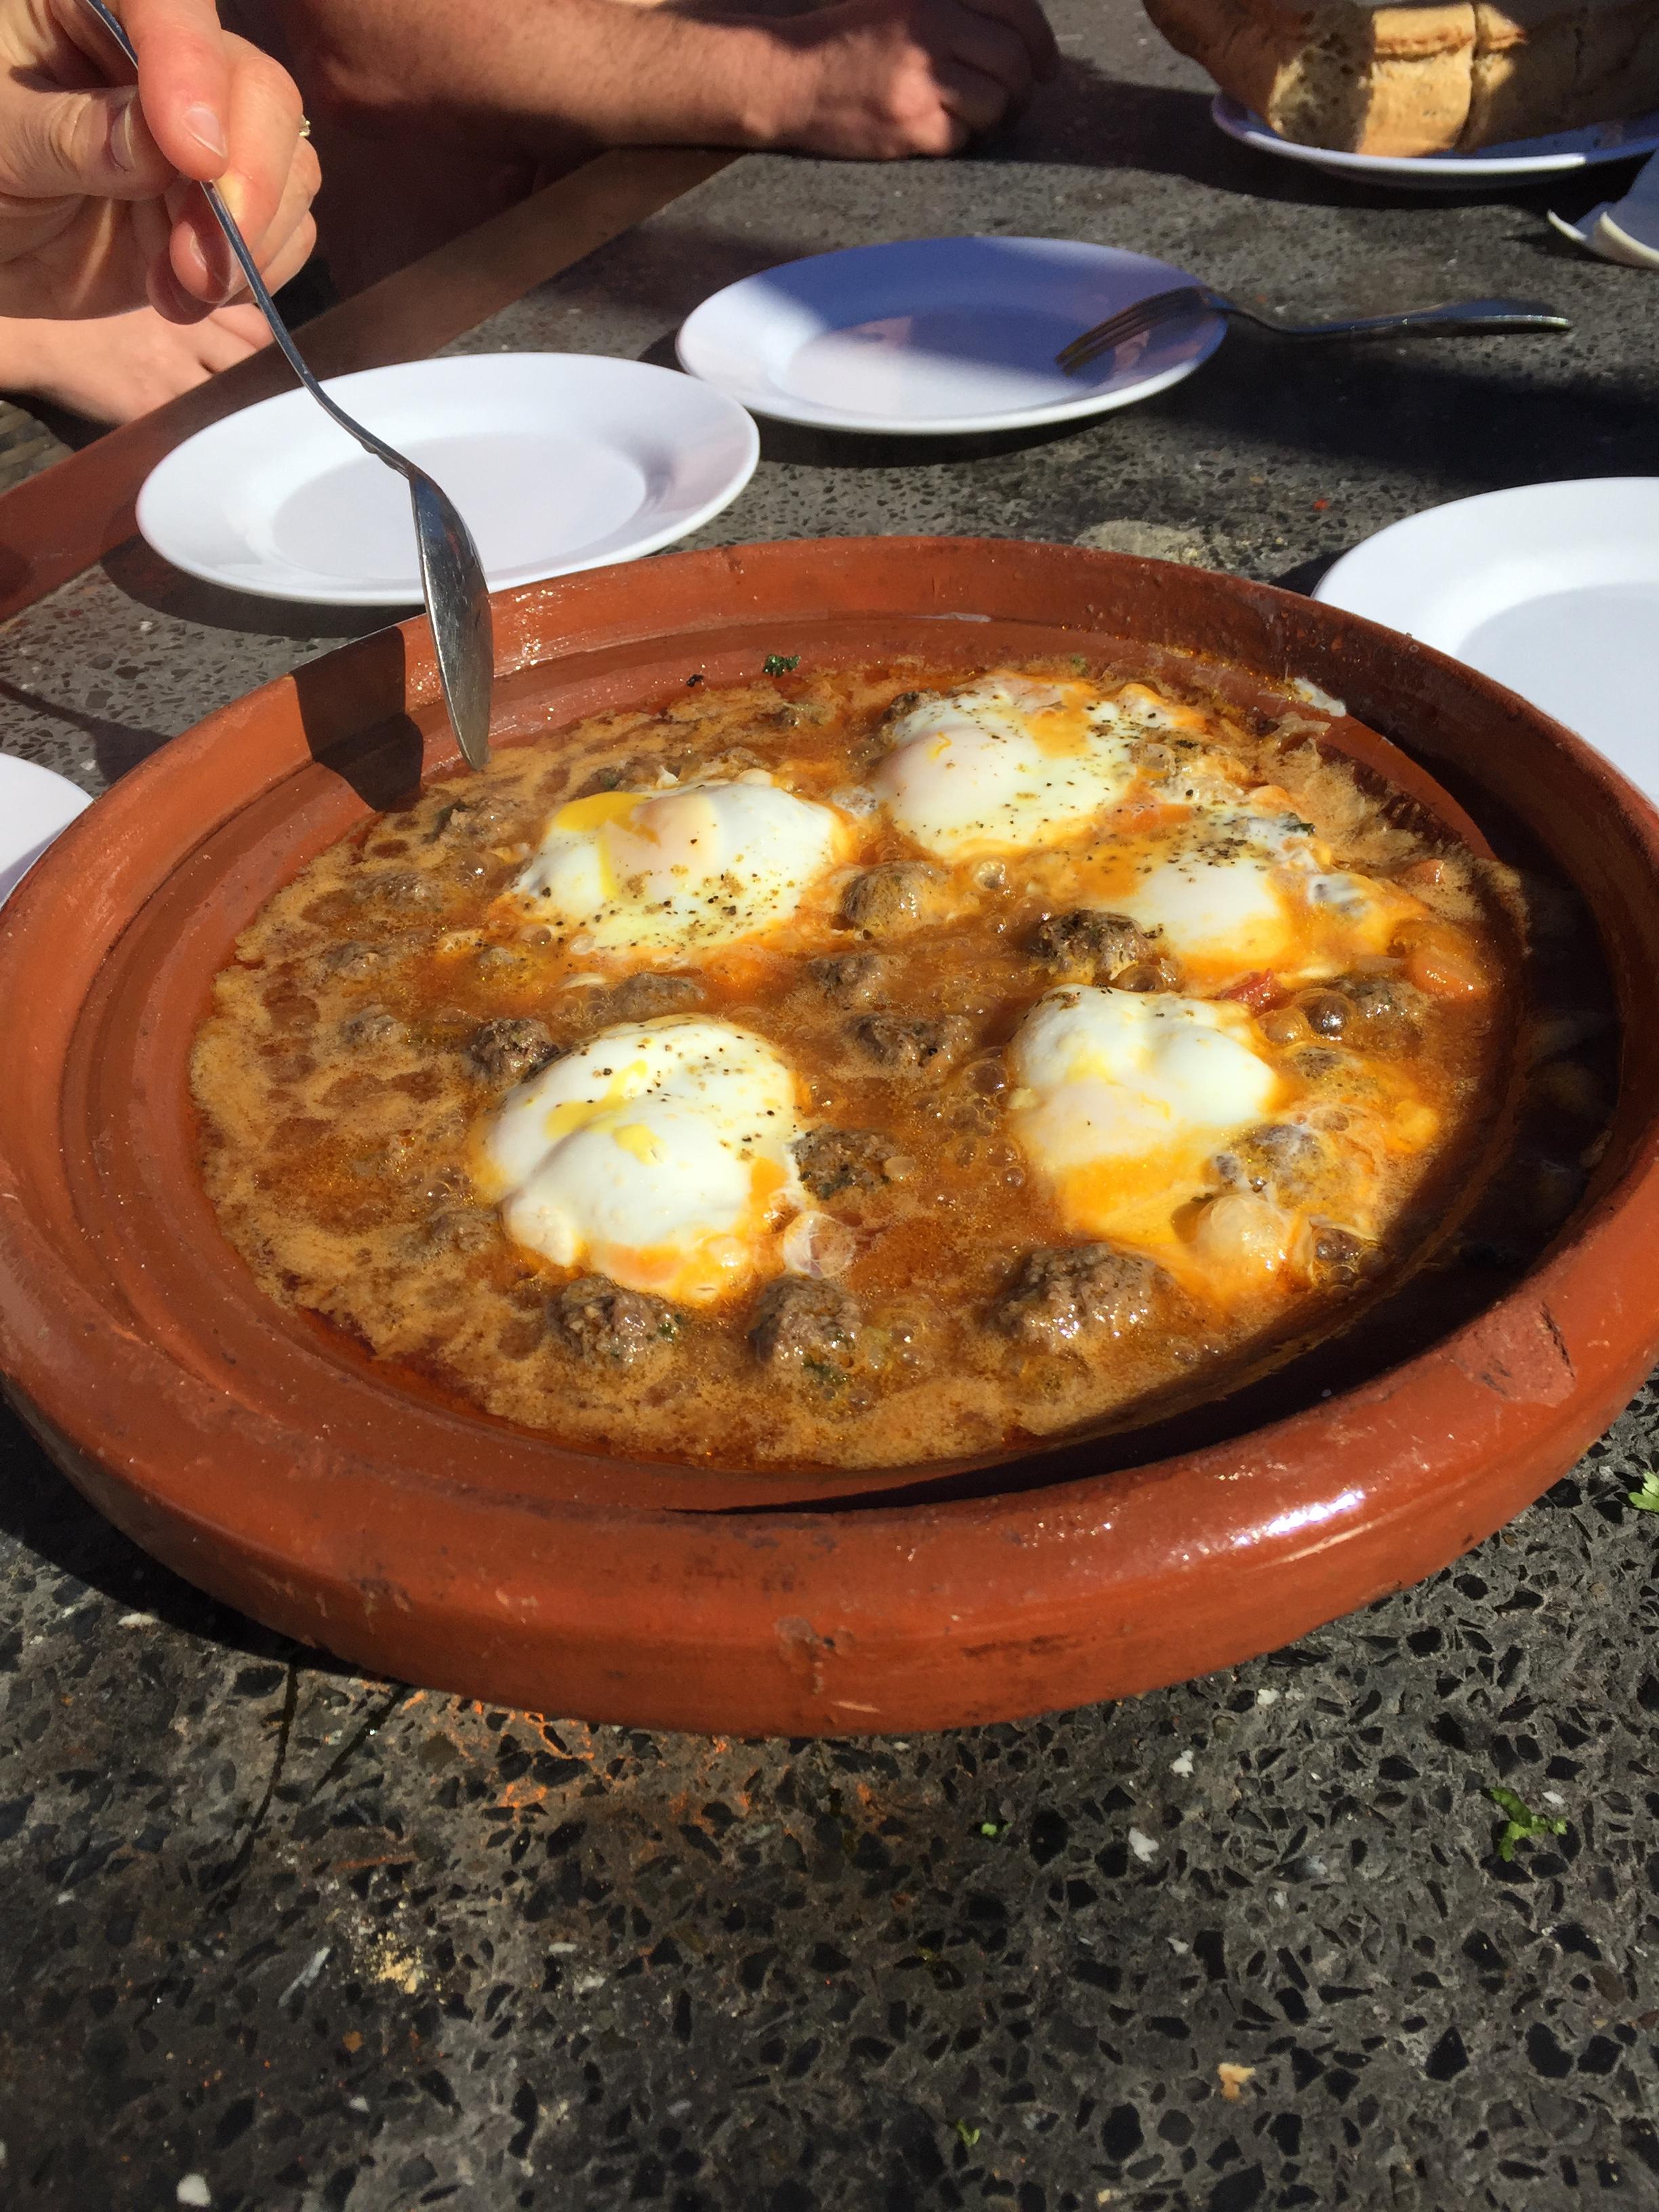 Recettes livre de cuisine Marocaine marrakech tagine Tagine Argile Pot de cuisine